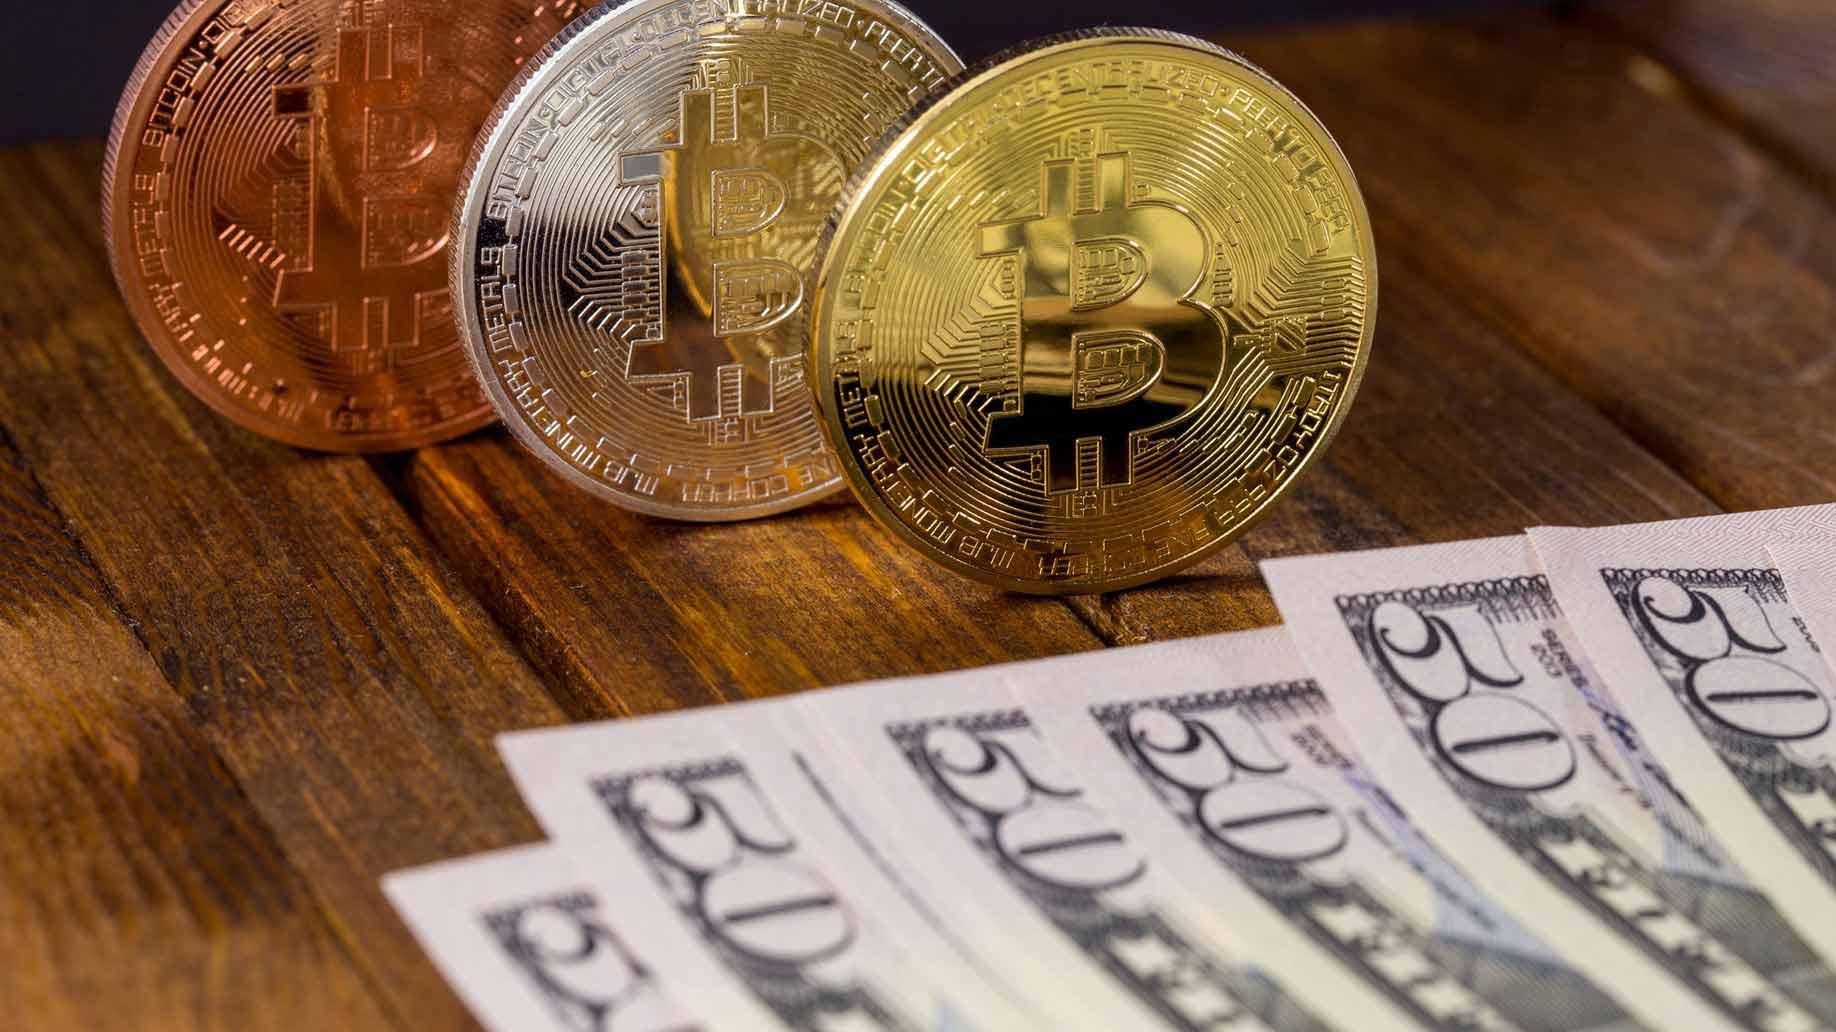 bitcoins and 50 dollar bills